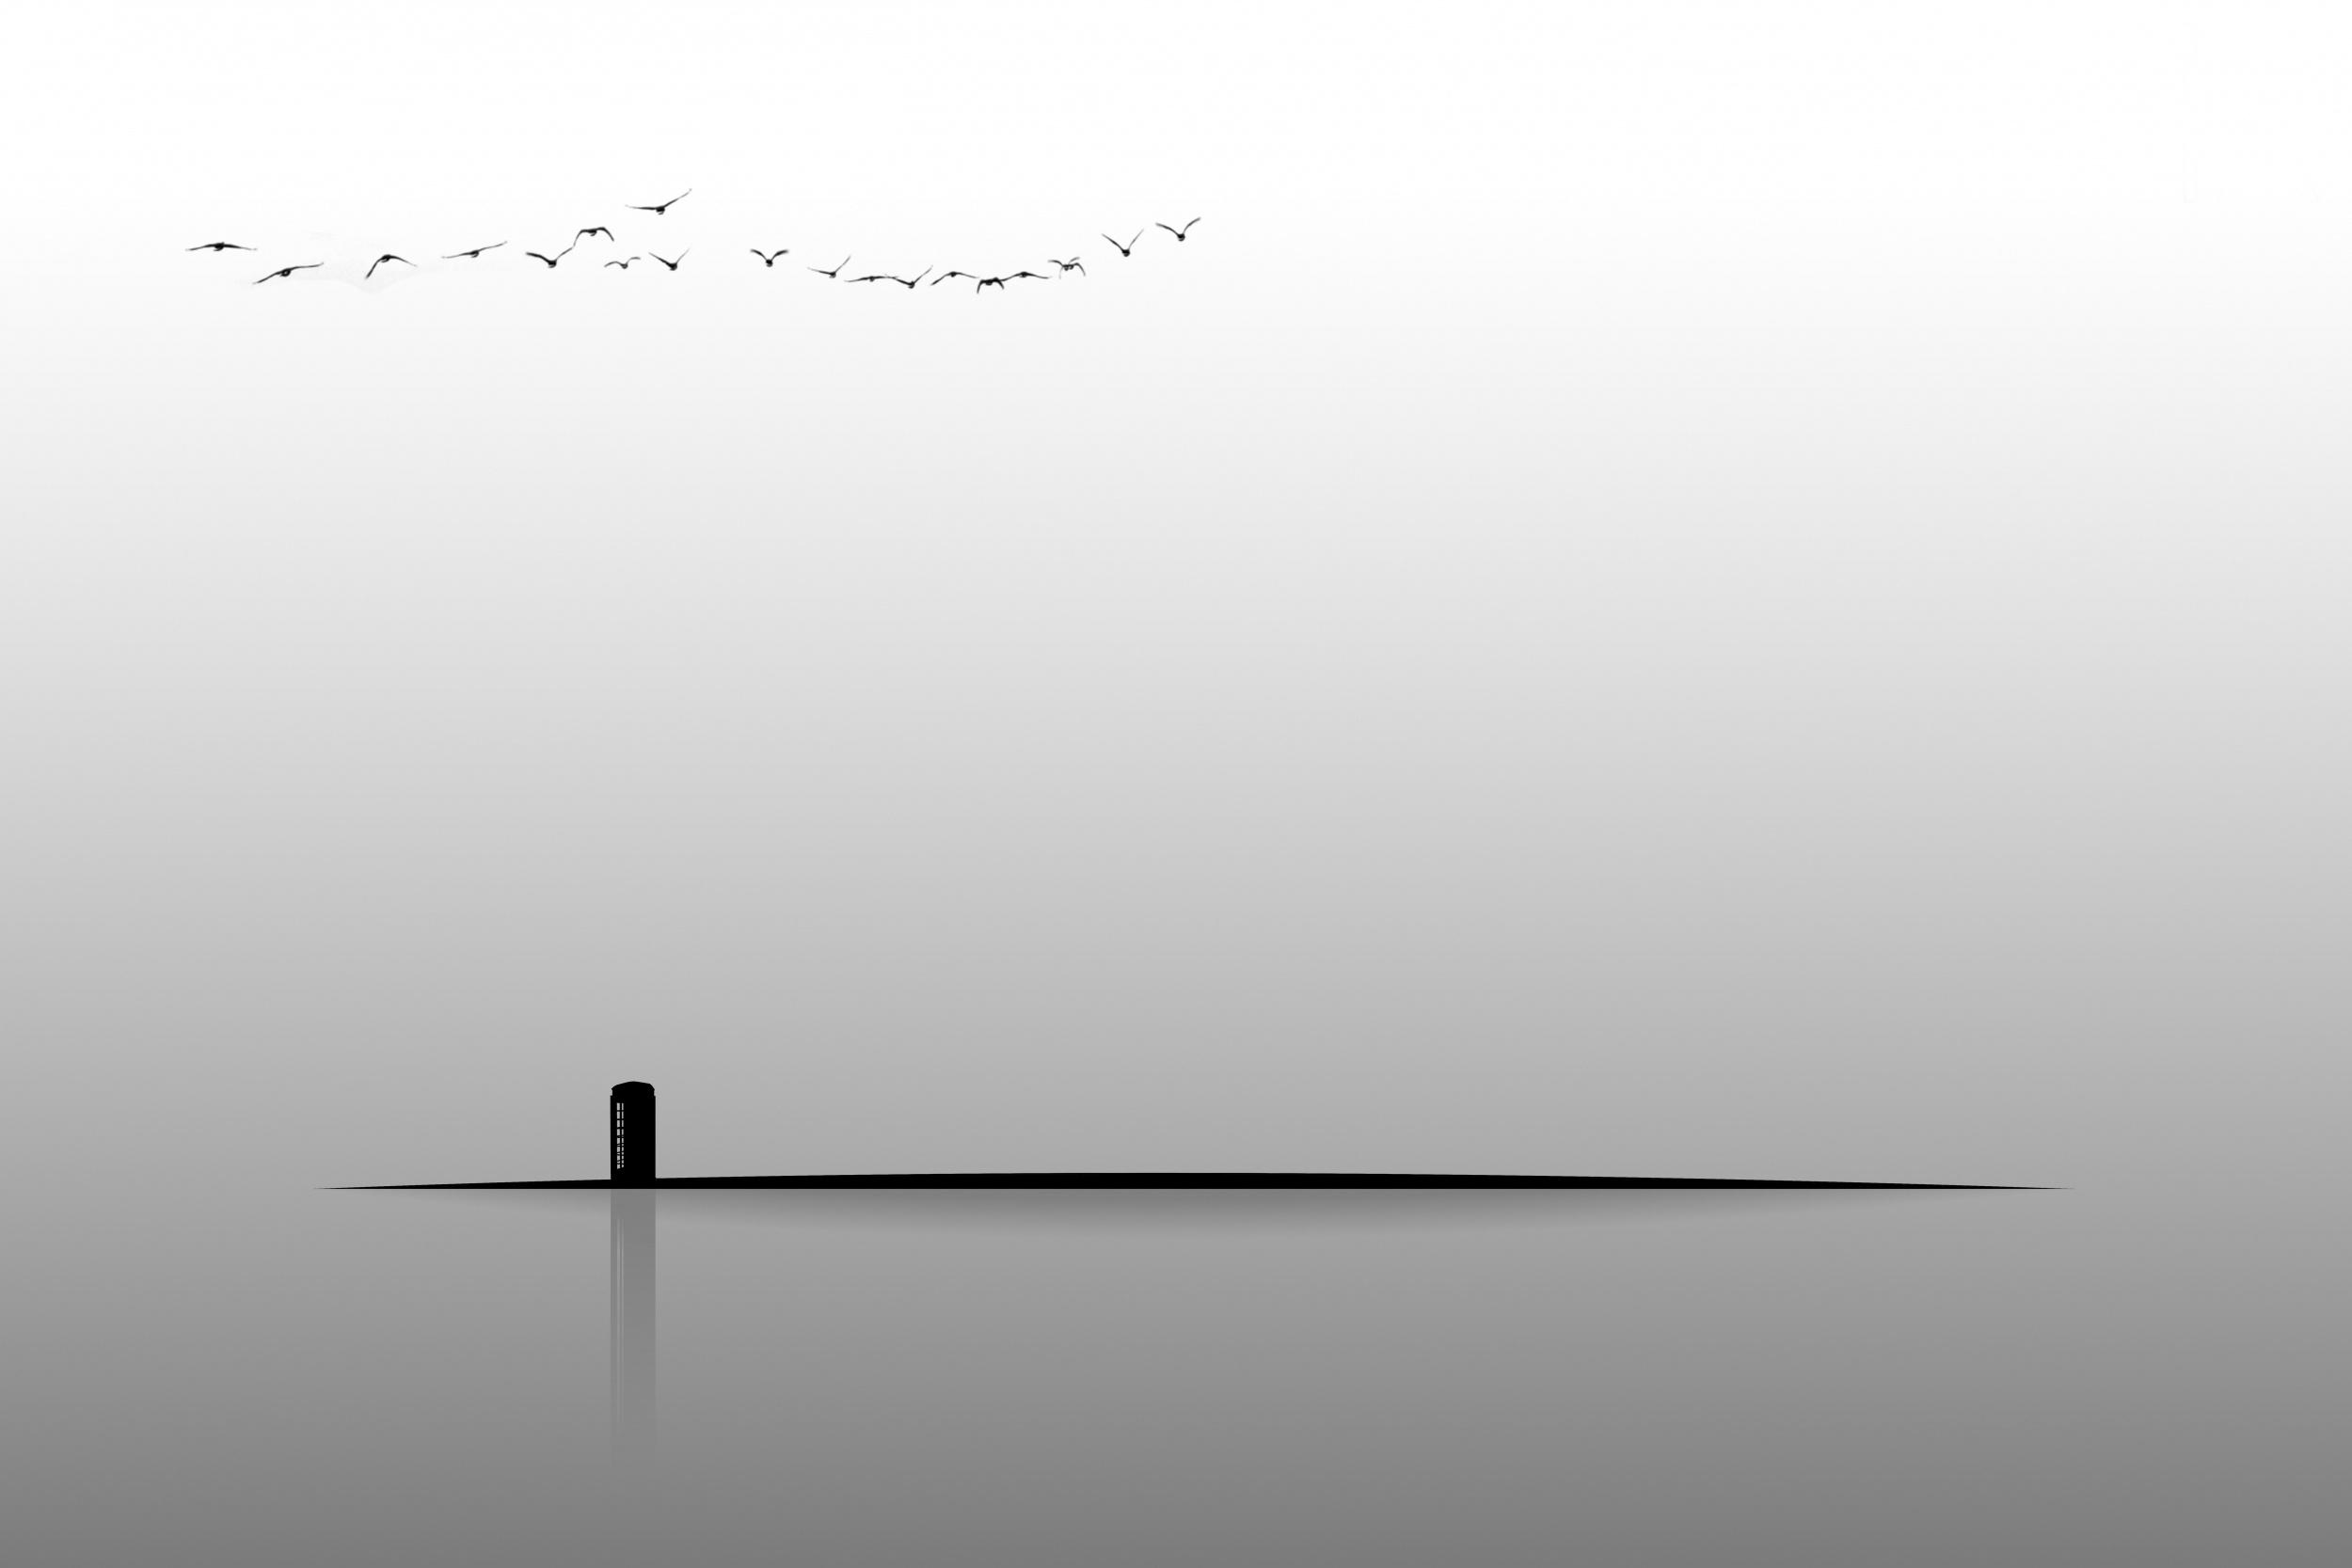 telephone booth minimalist wallpaper birds shadow vector wallpaper 2500x1667